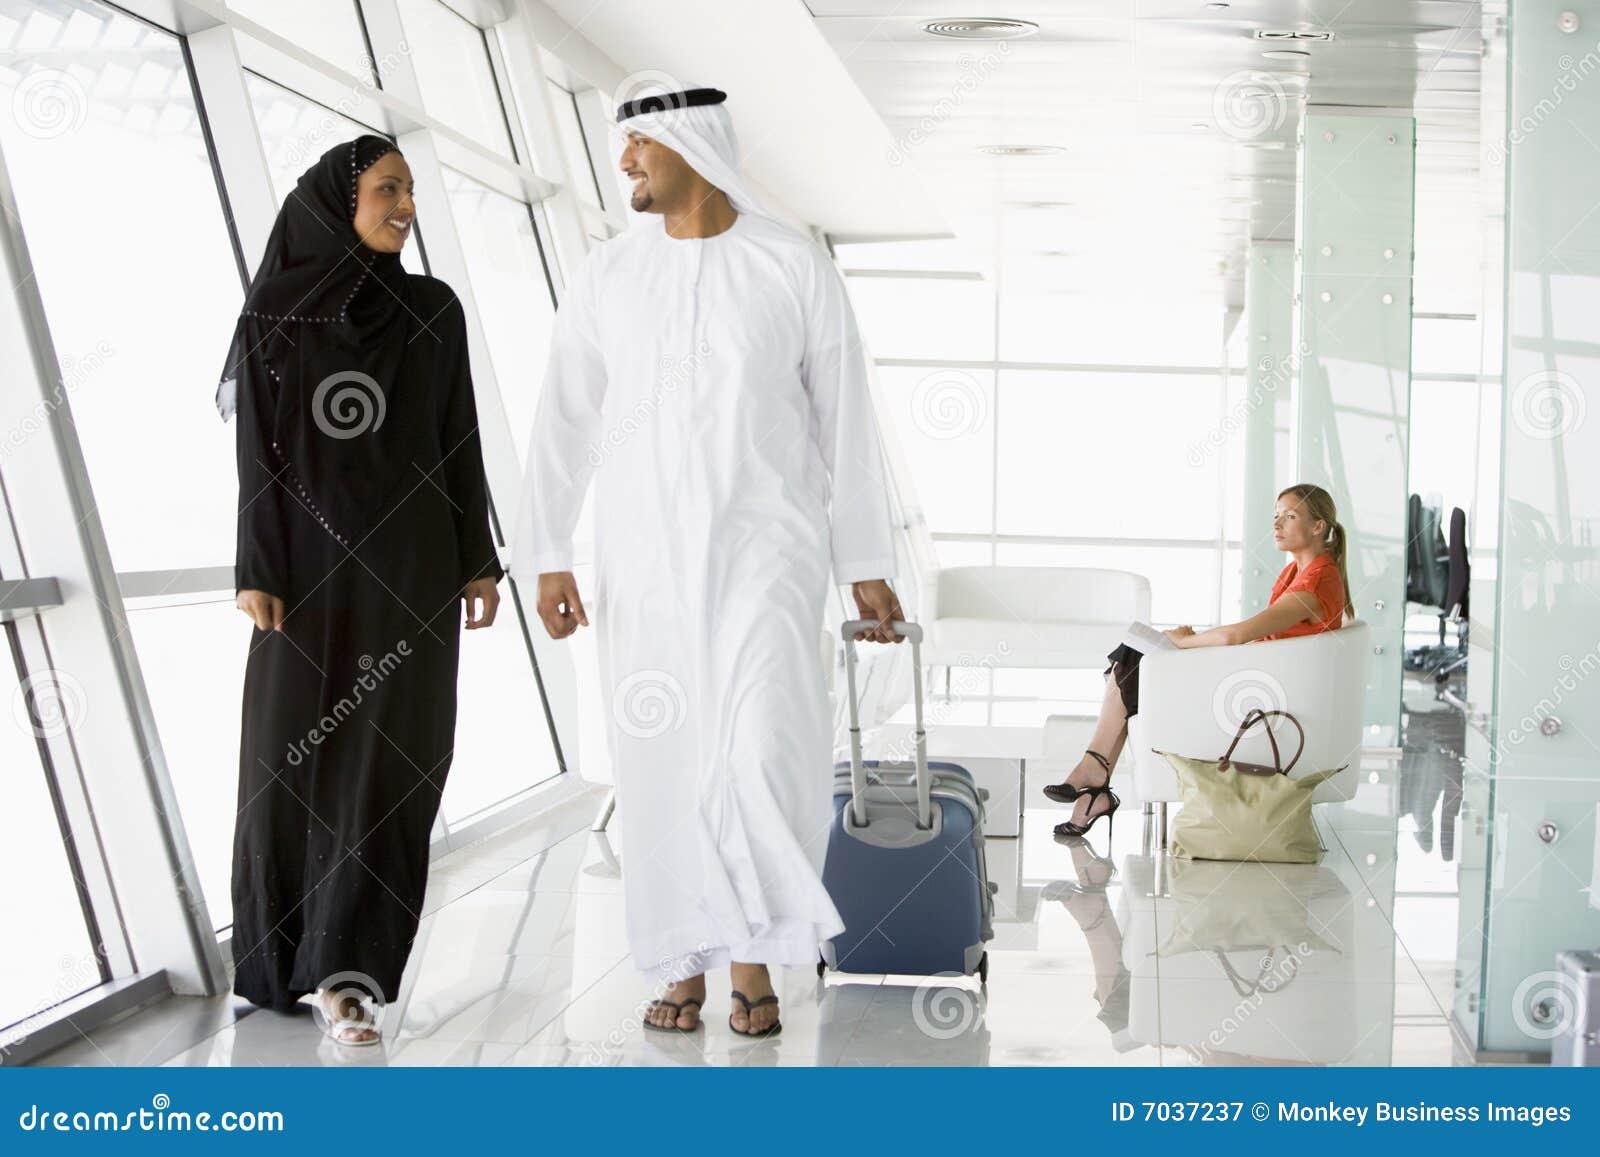 Couple walking through airport departure lounge